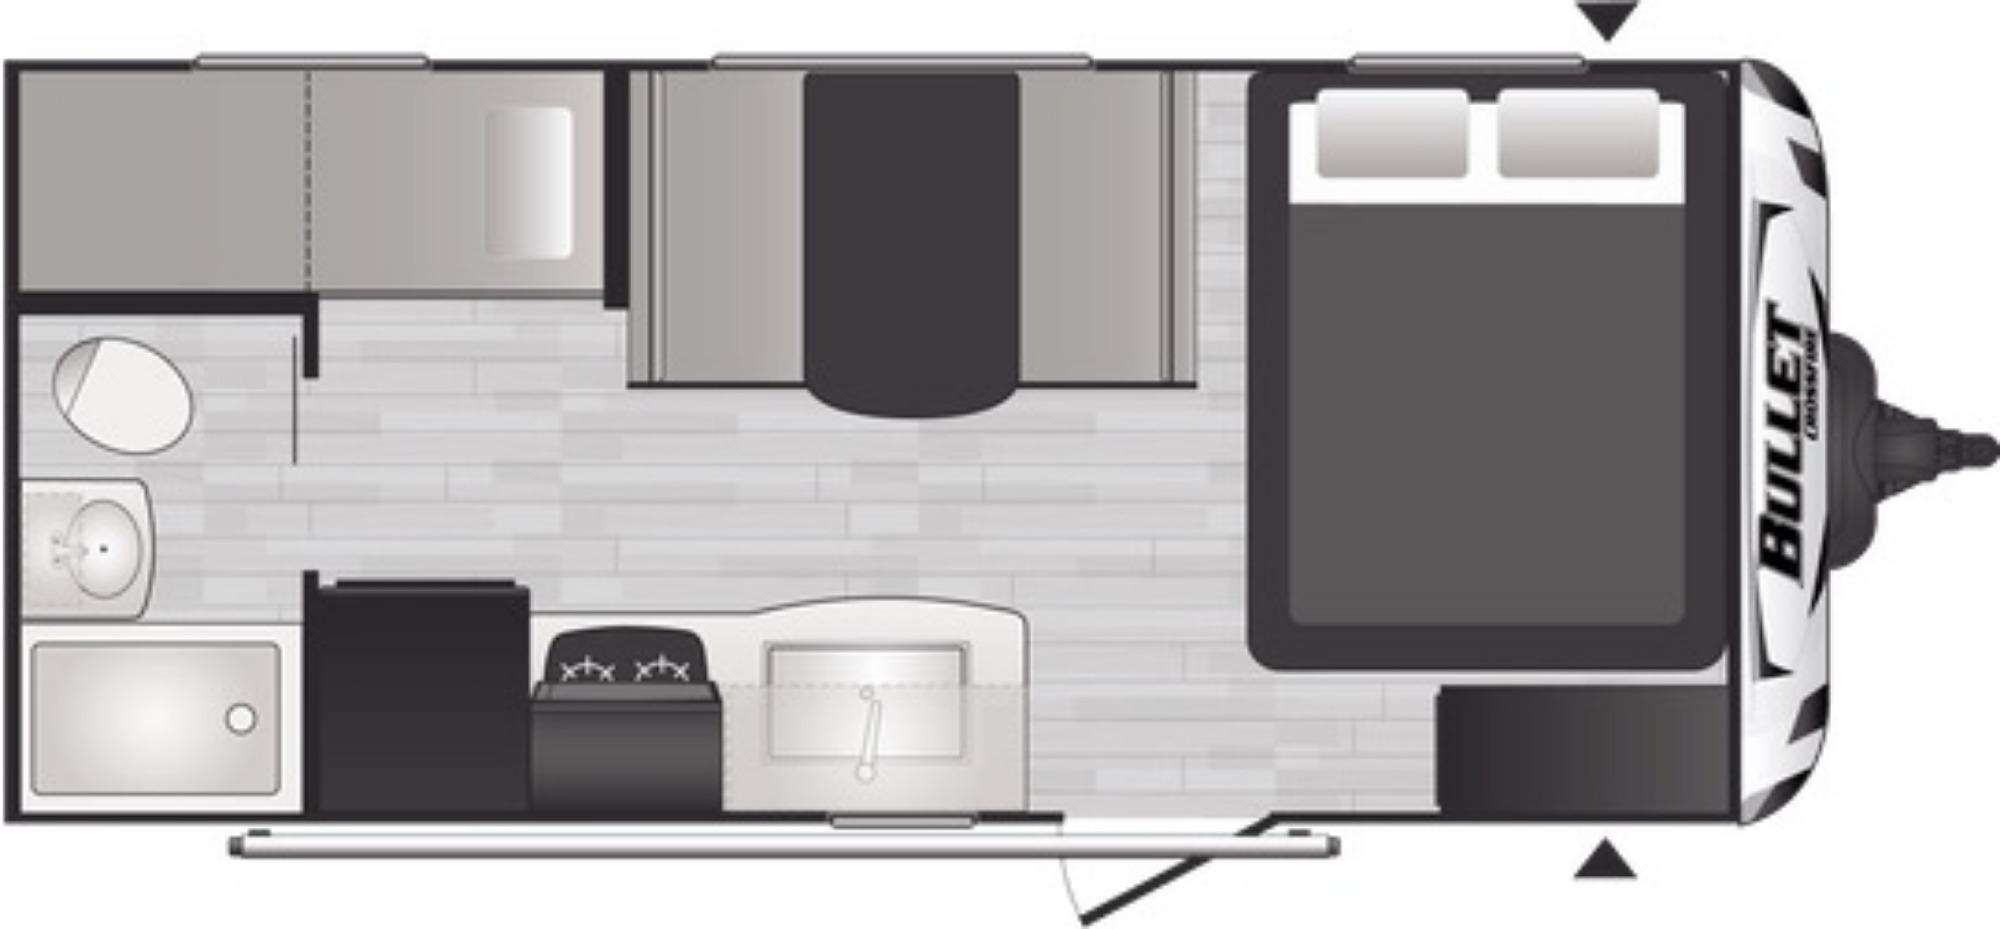 View Floor Plan for 2022 KEYSTONE BULLET CROSSFIRE 1700BH